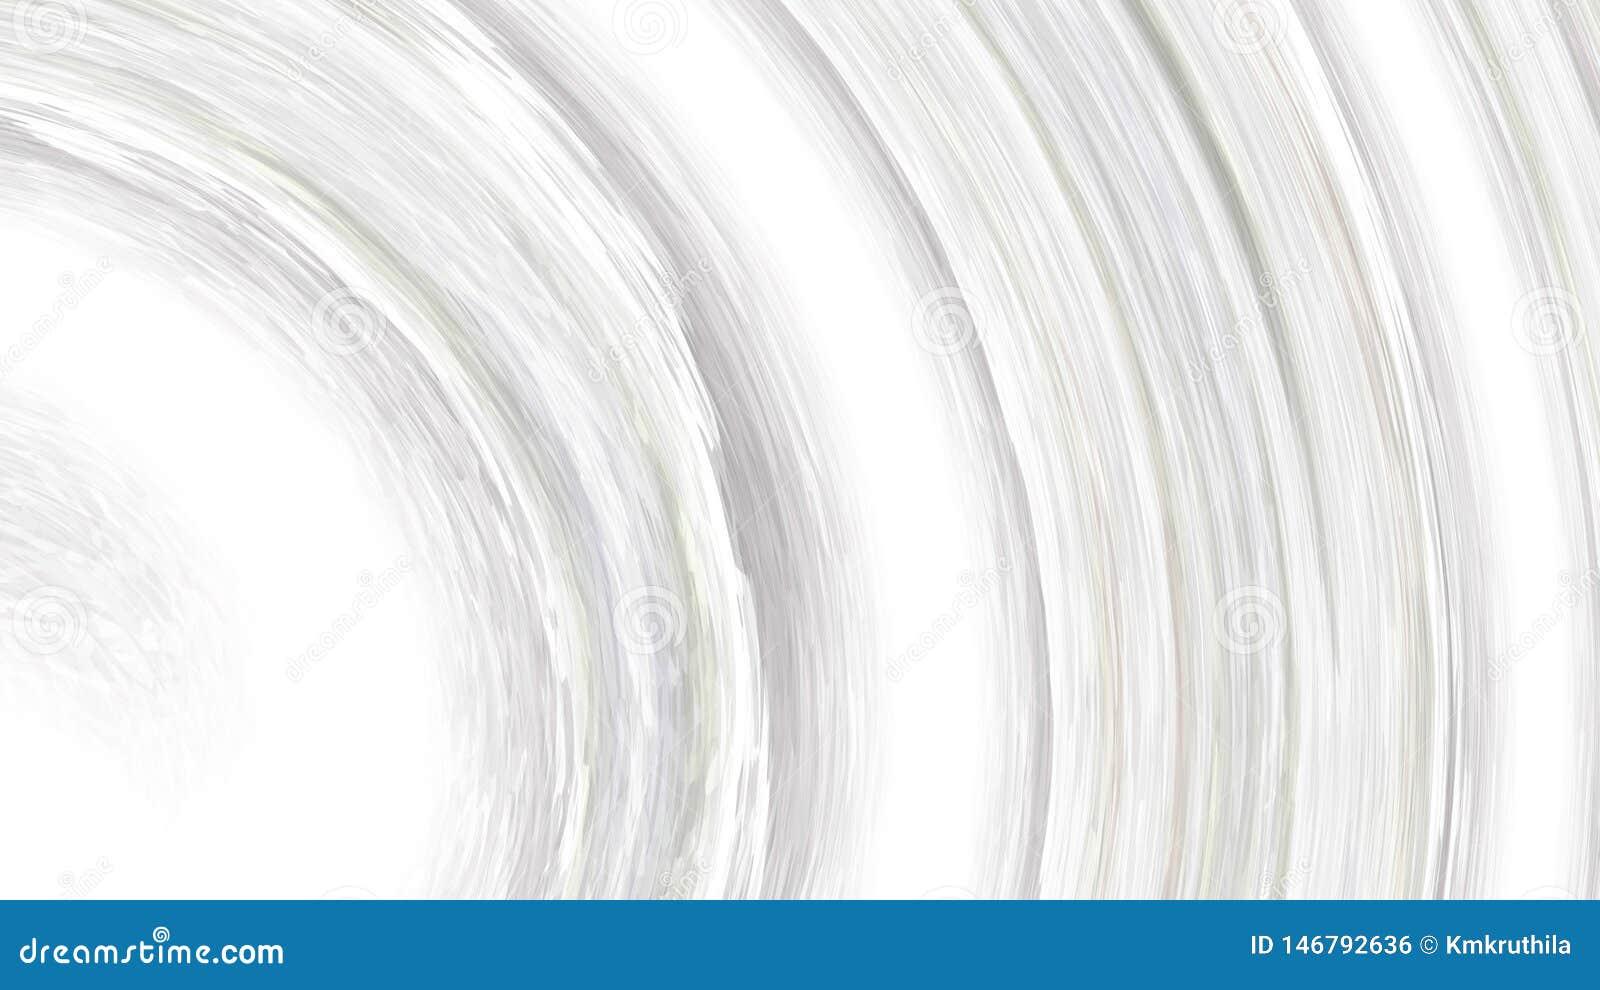 White Line Material Property Background Beautiful elegant Illustration graphic art design Background